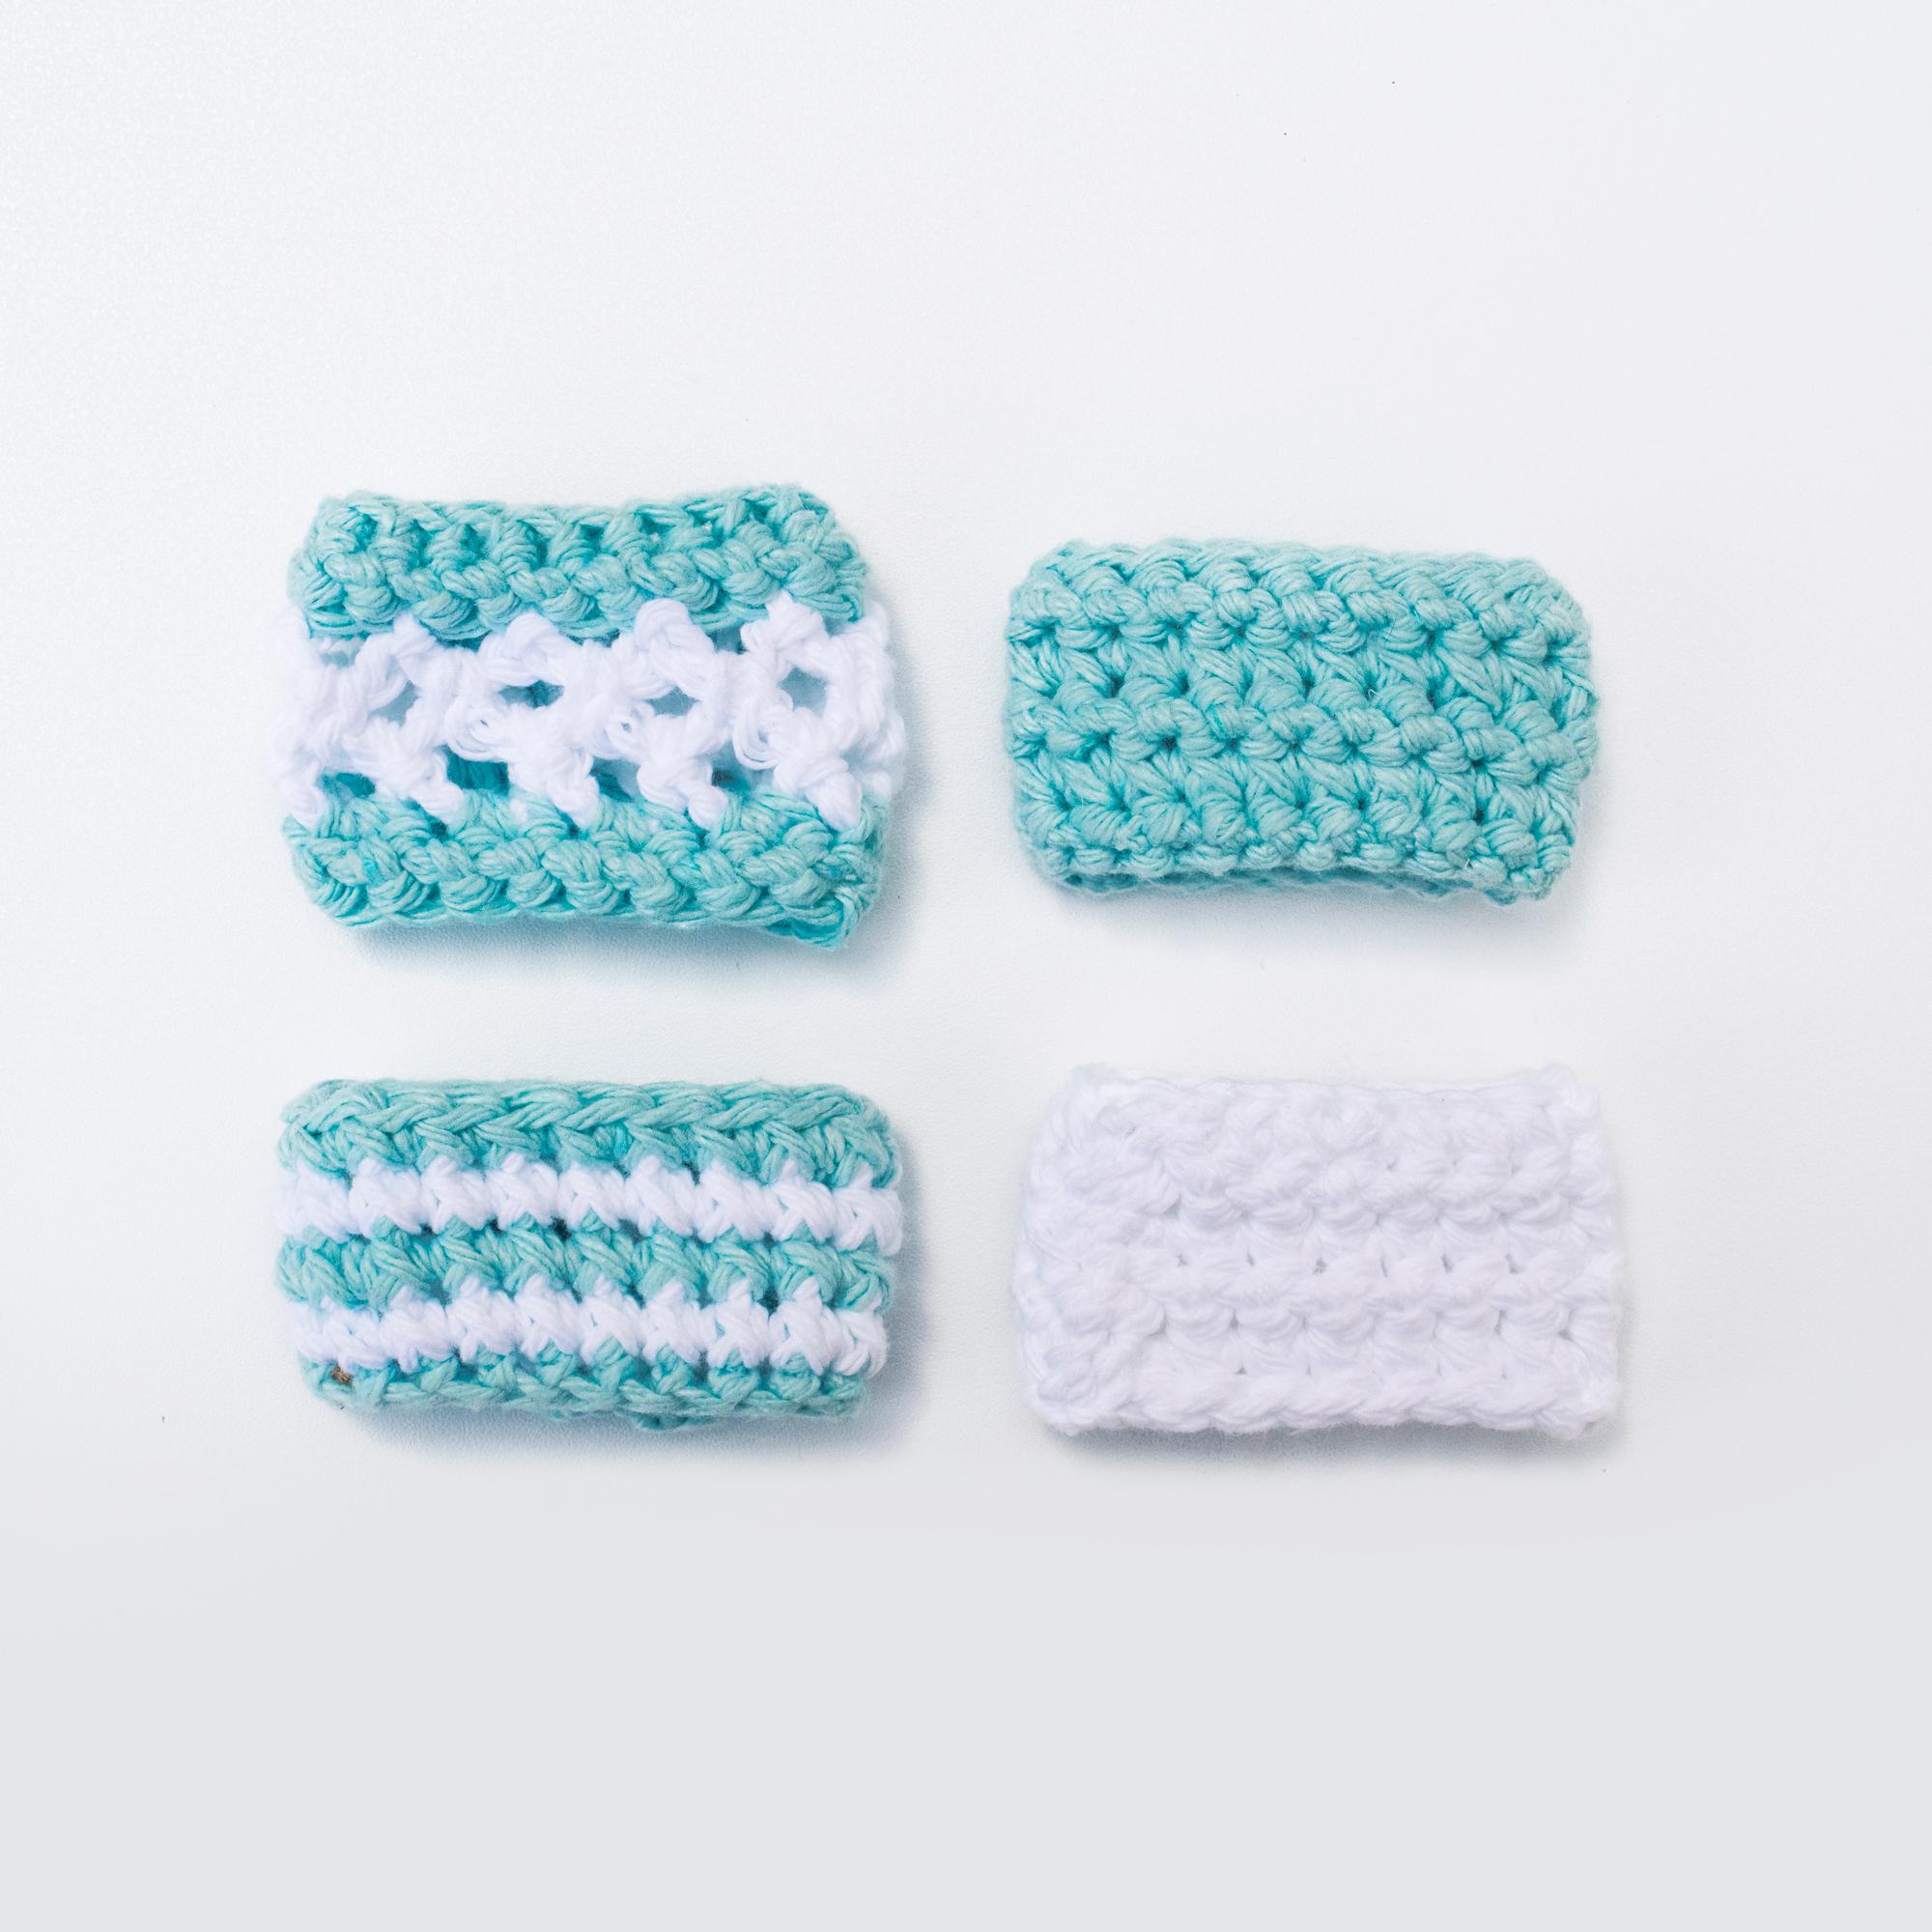 Crochet Napkin Ring Free Pattern